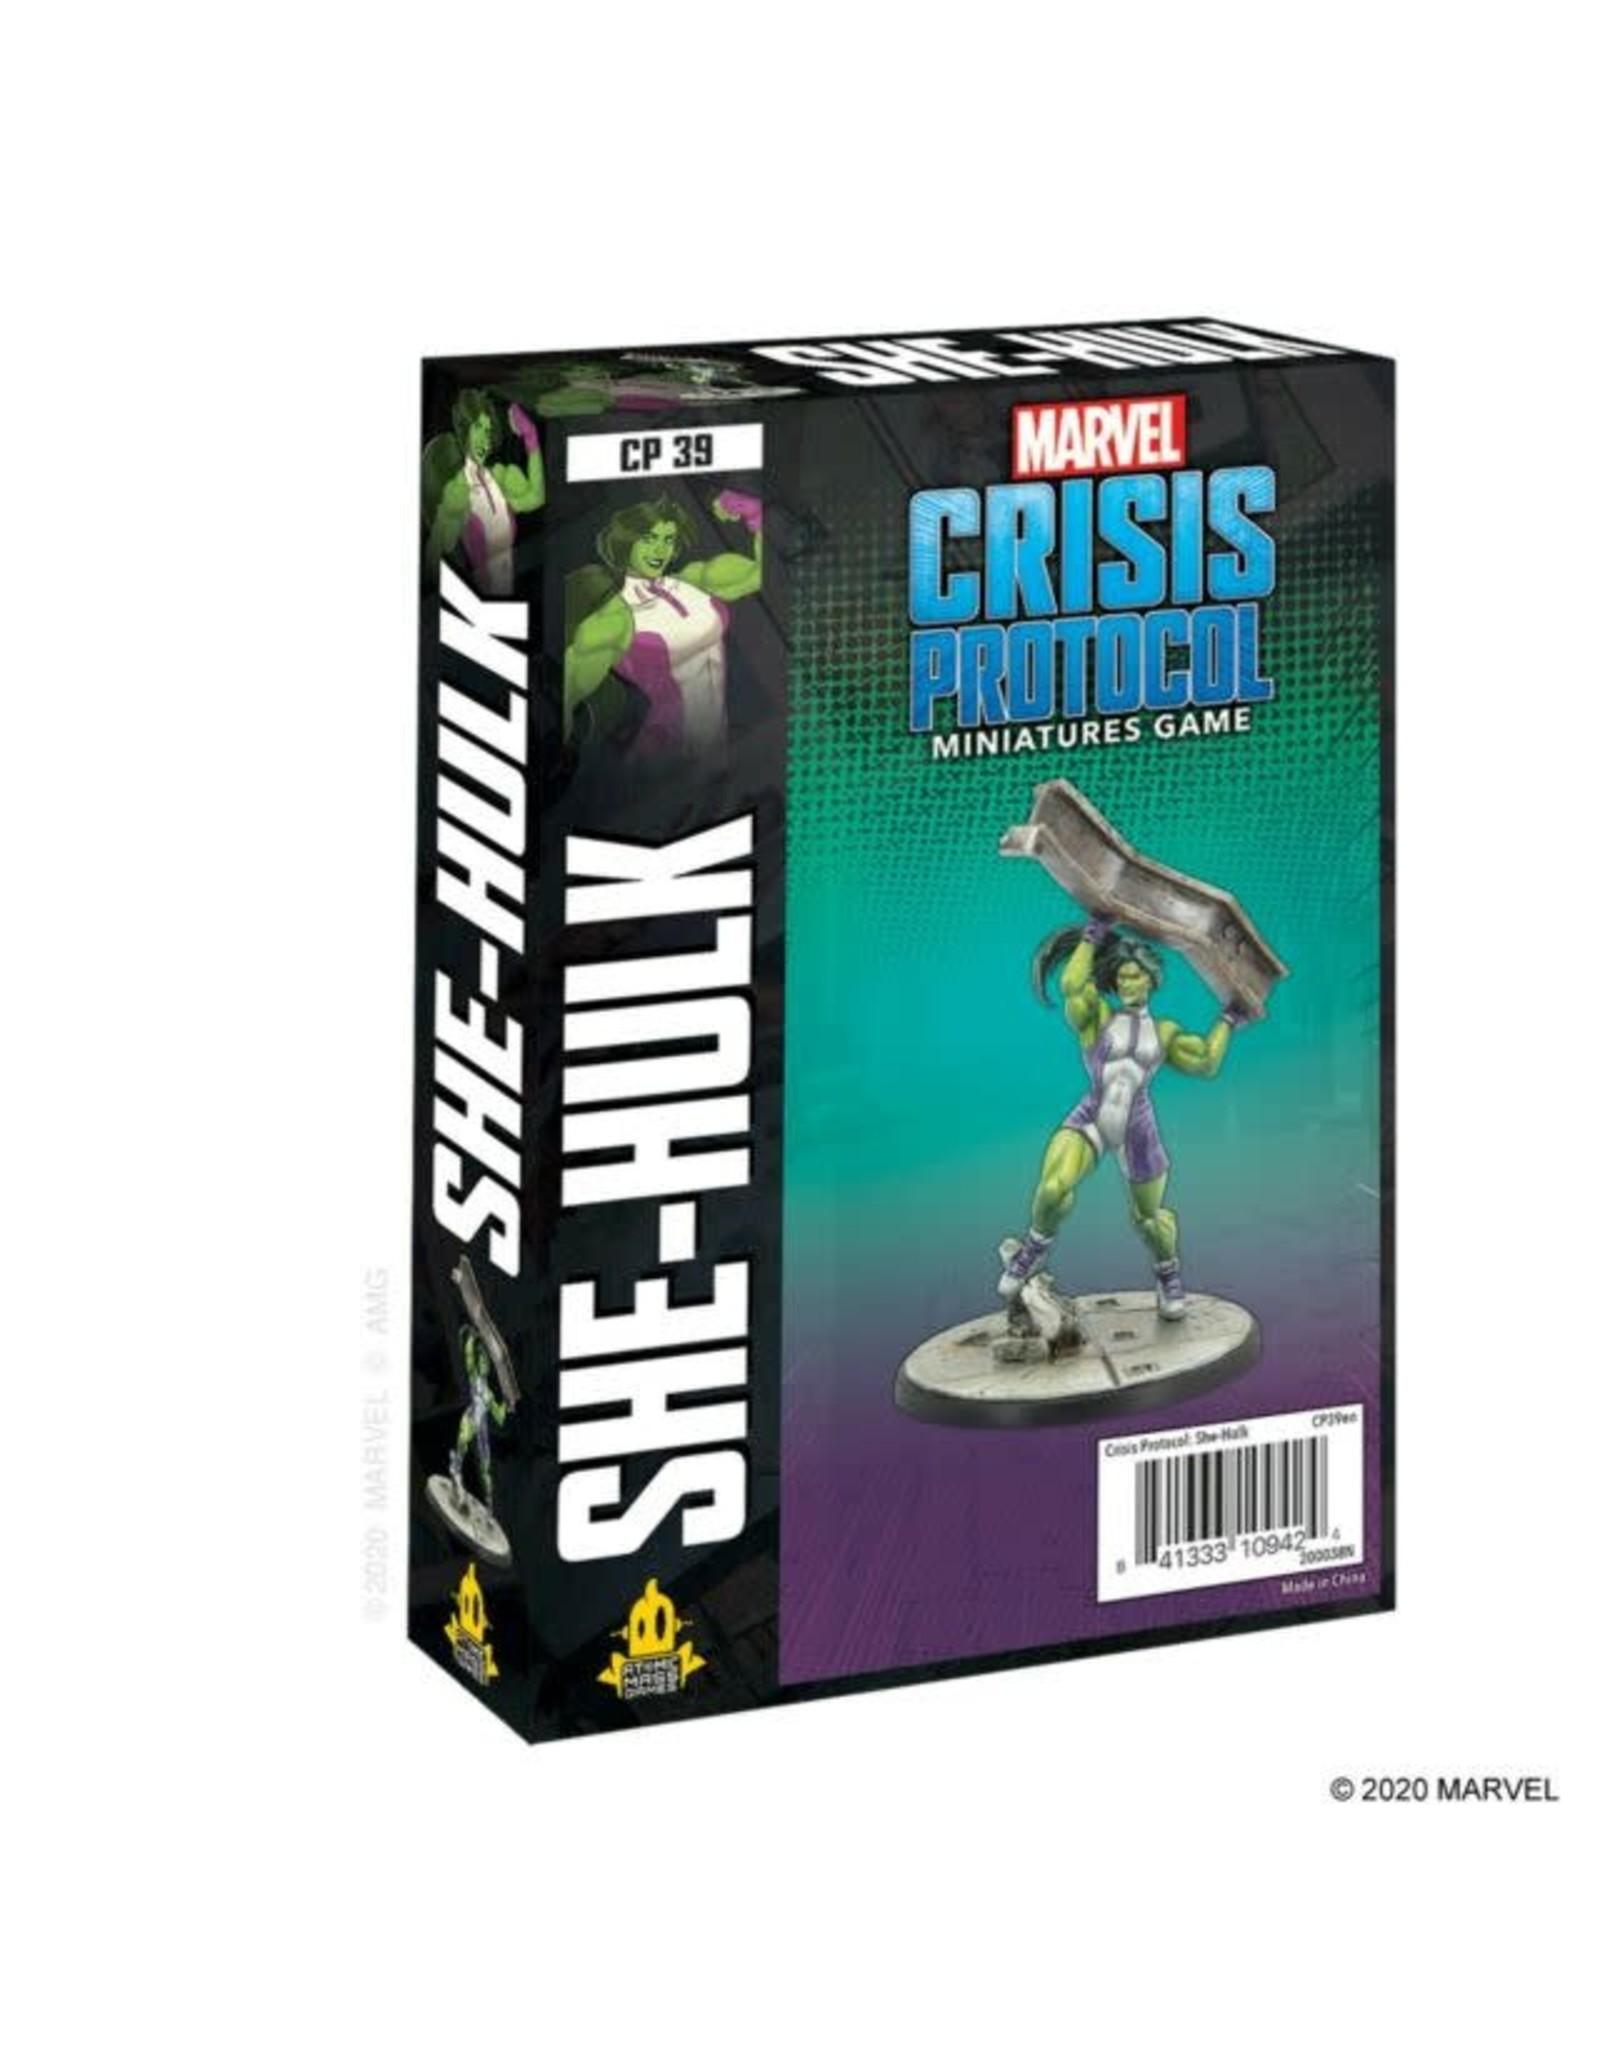 Atomic Mass Games Marvel Crisis Protocol: She Hulk Character Pack